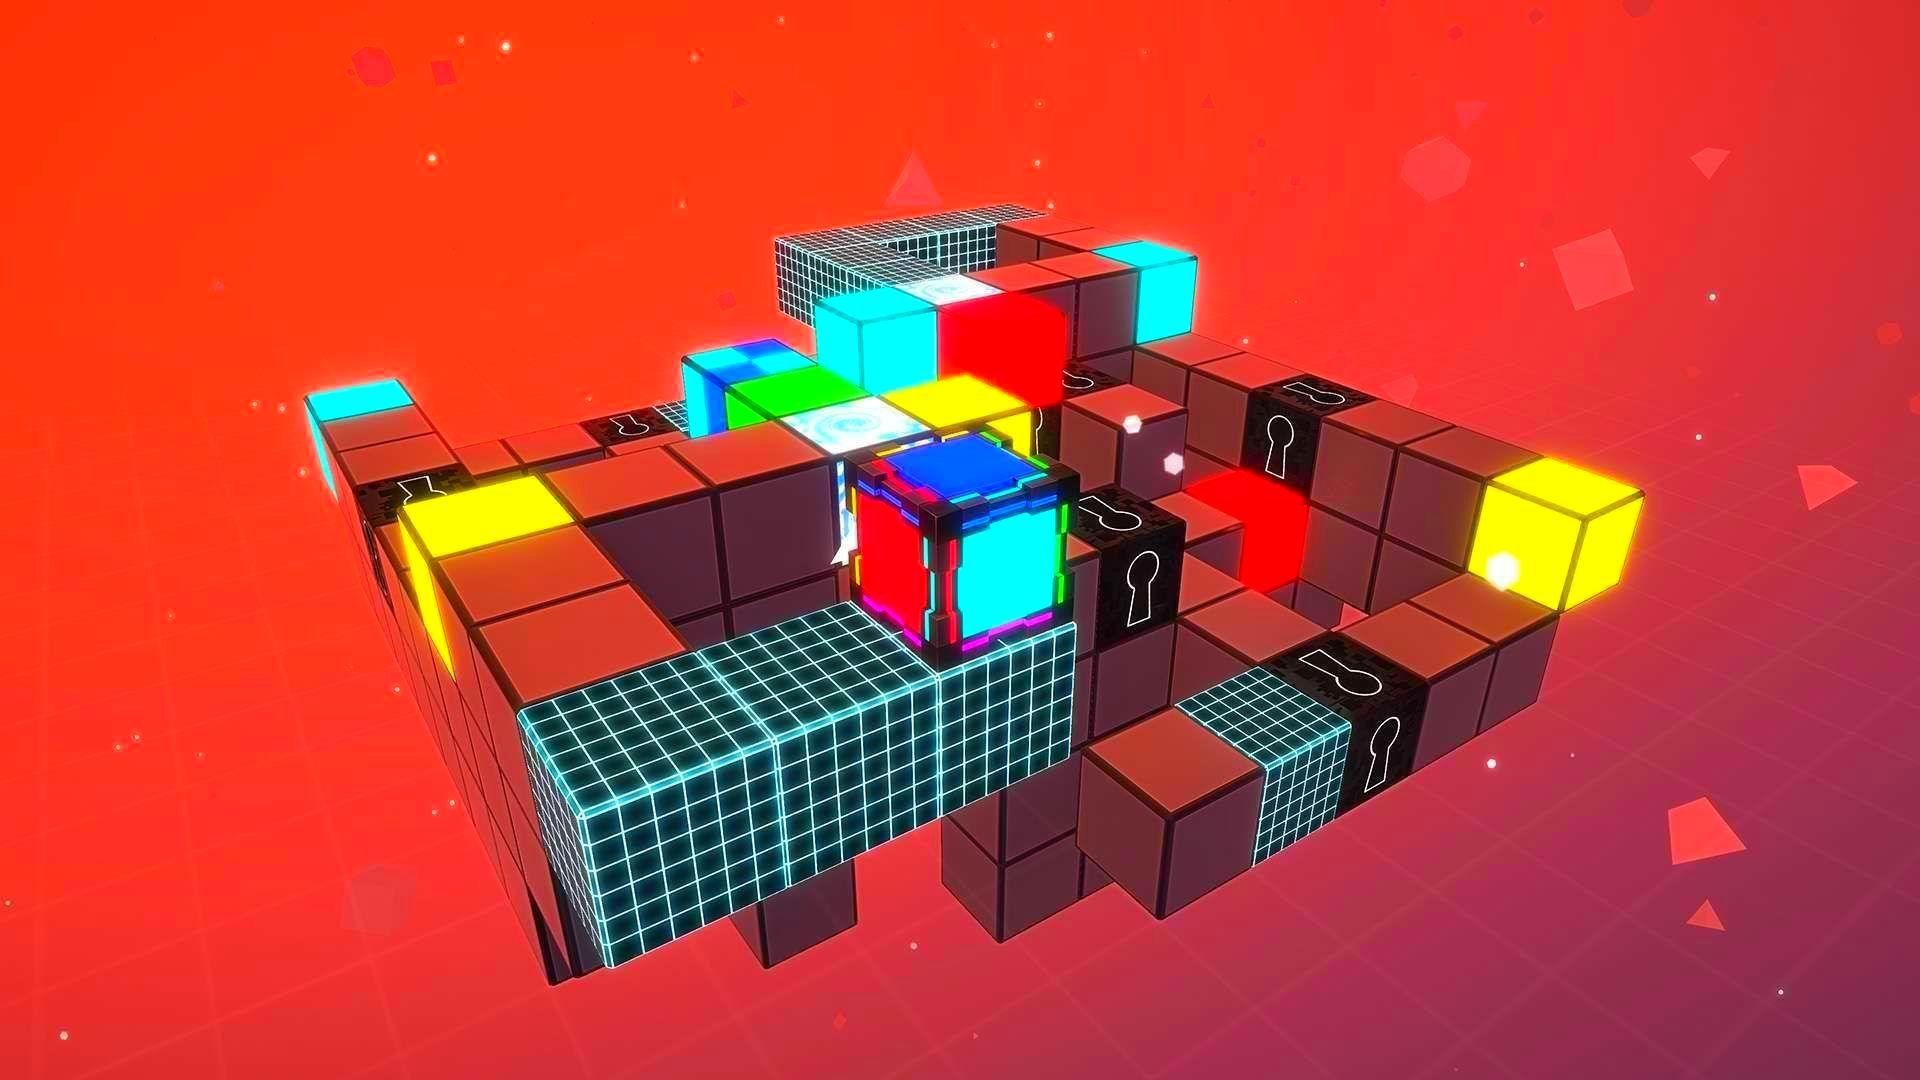 fractalbox_cubikolor_screen_02.jpg